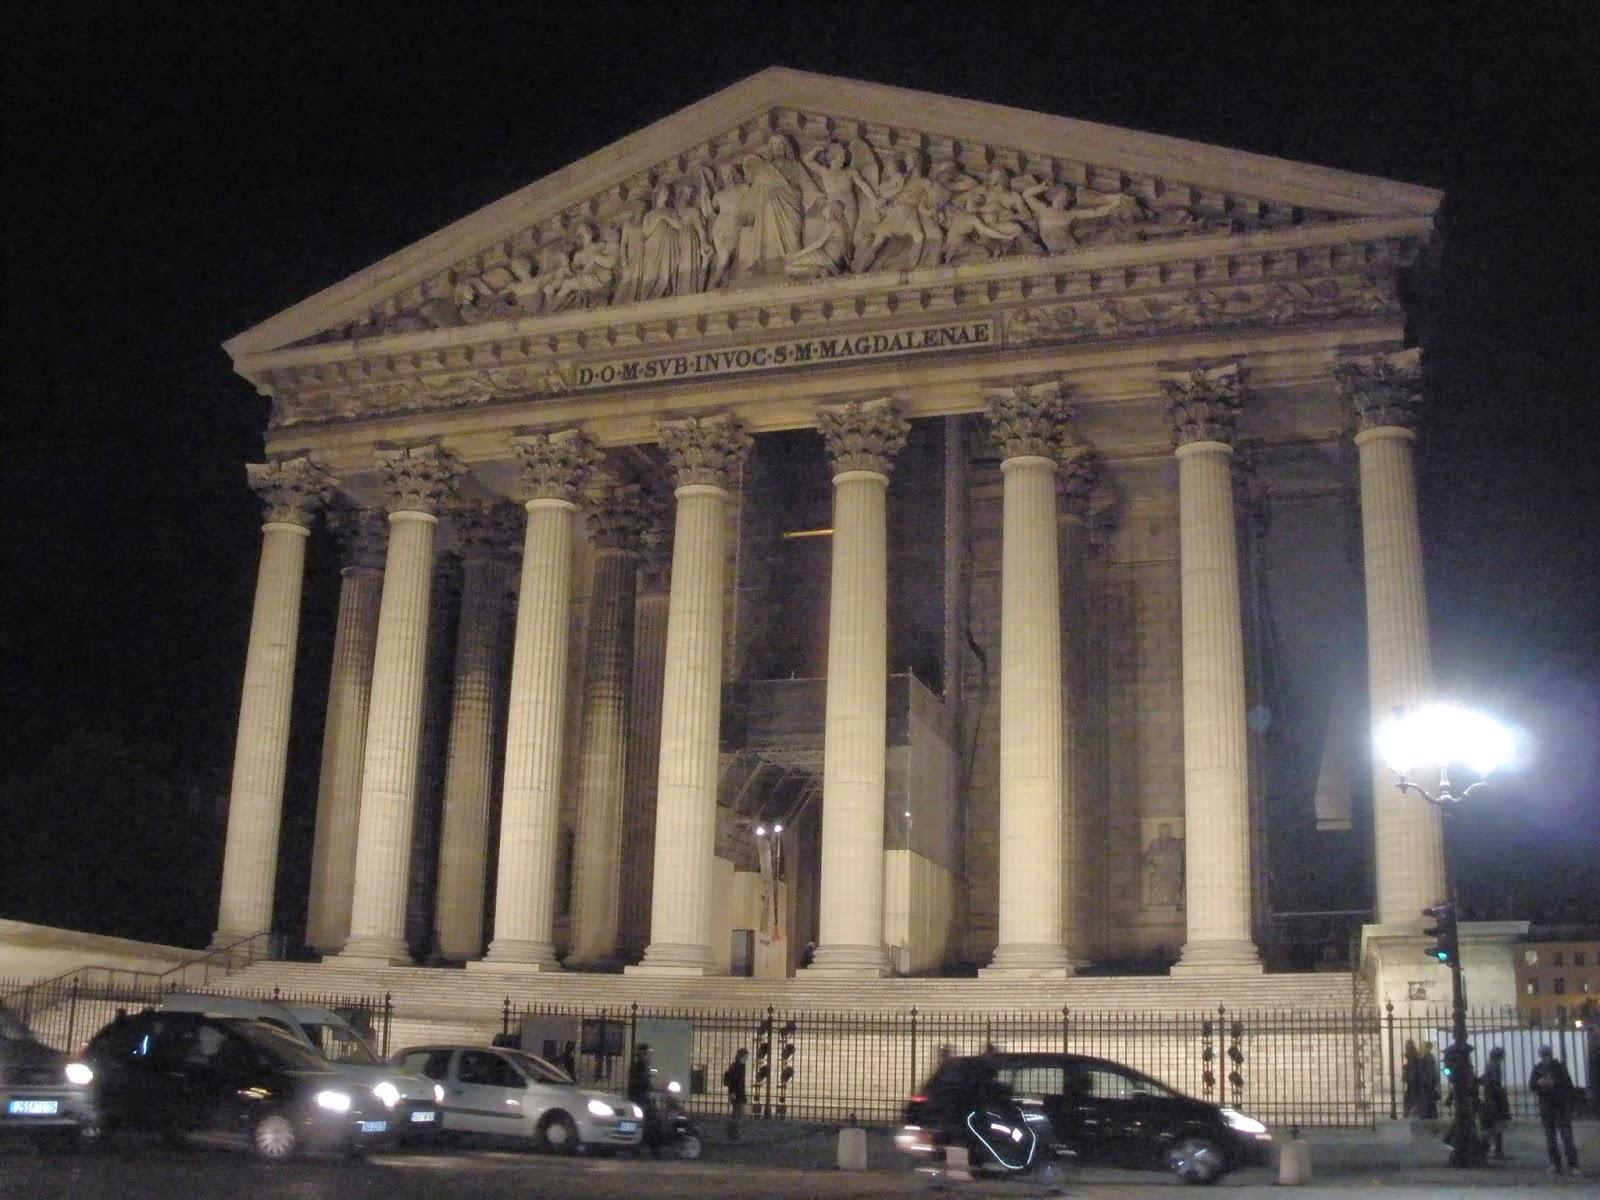 Iglesia de La Madeleine, de estilo clásico como la Antigua Grecia